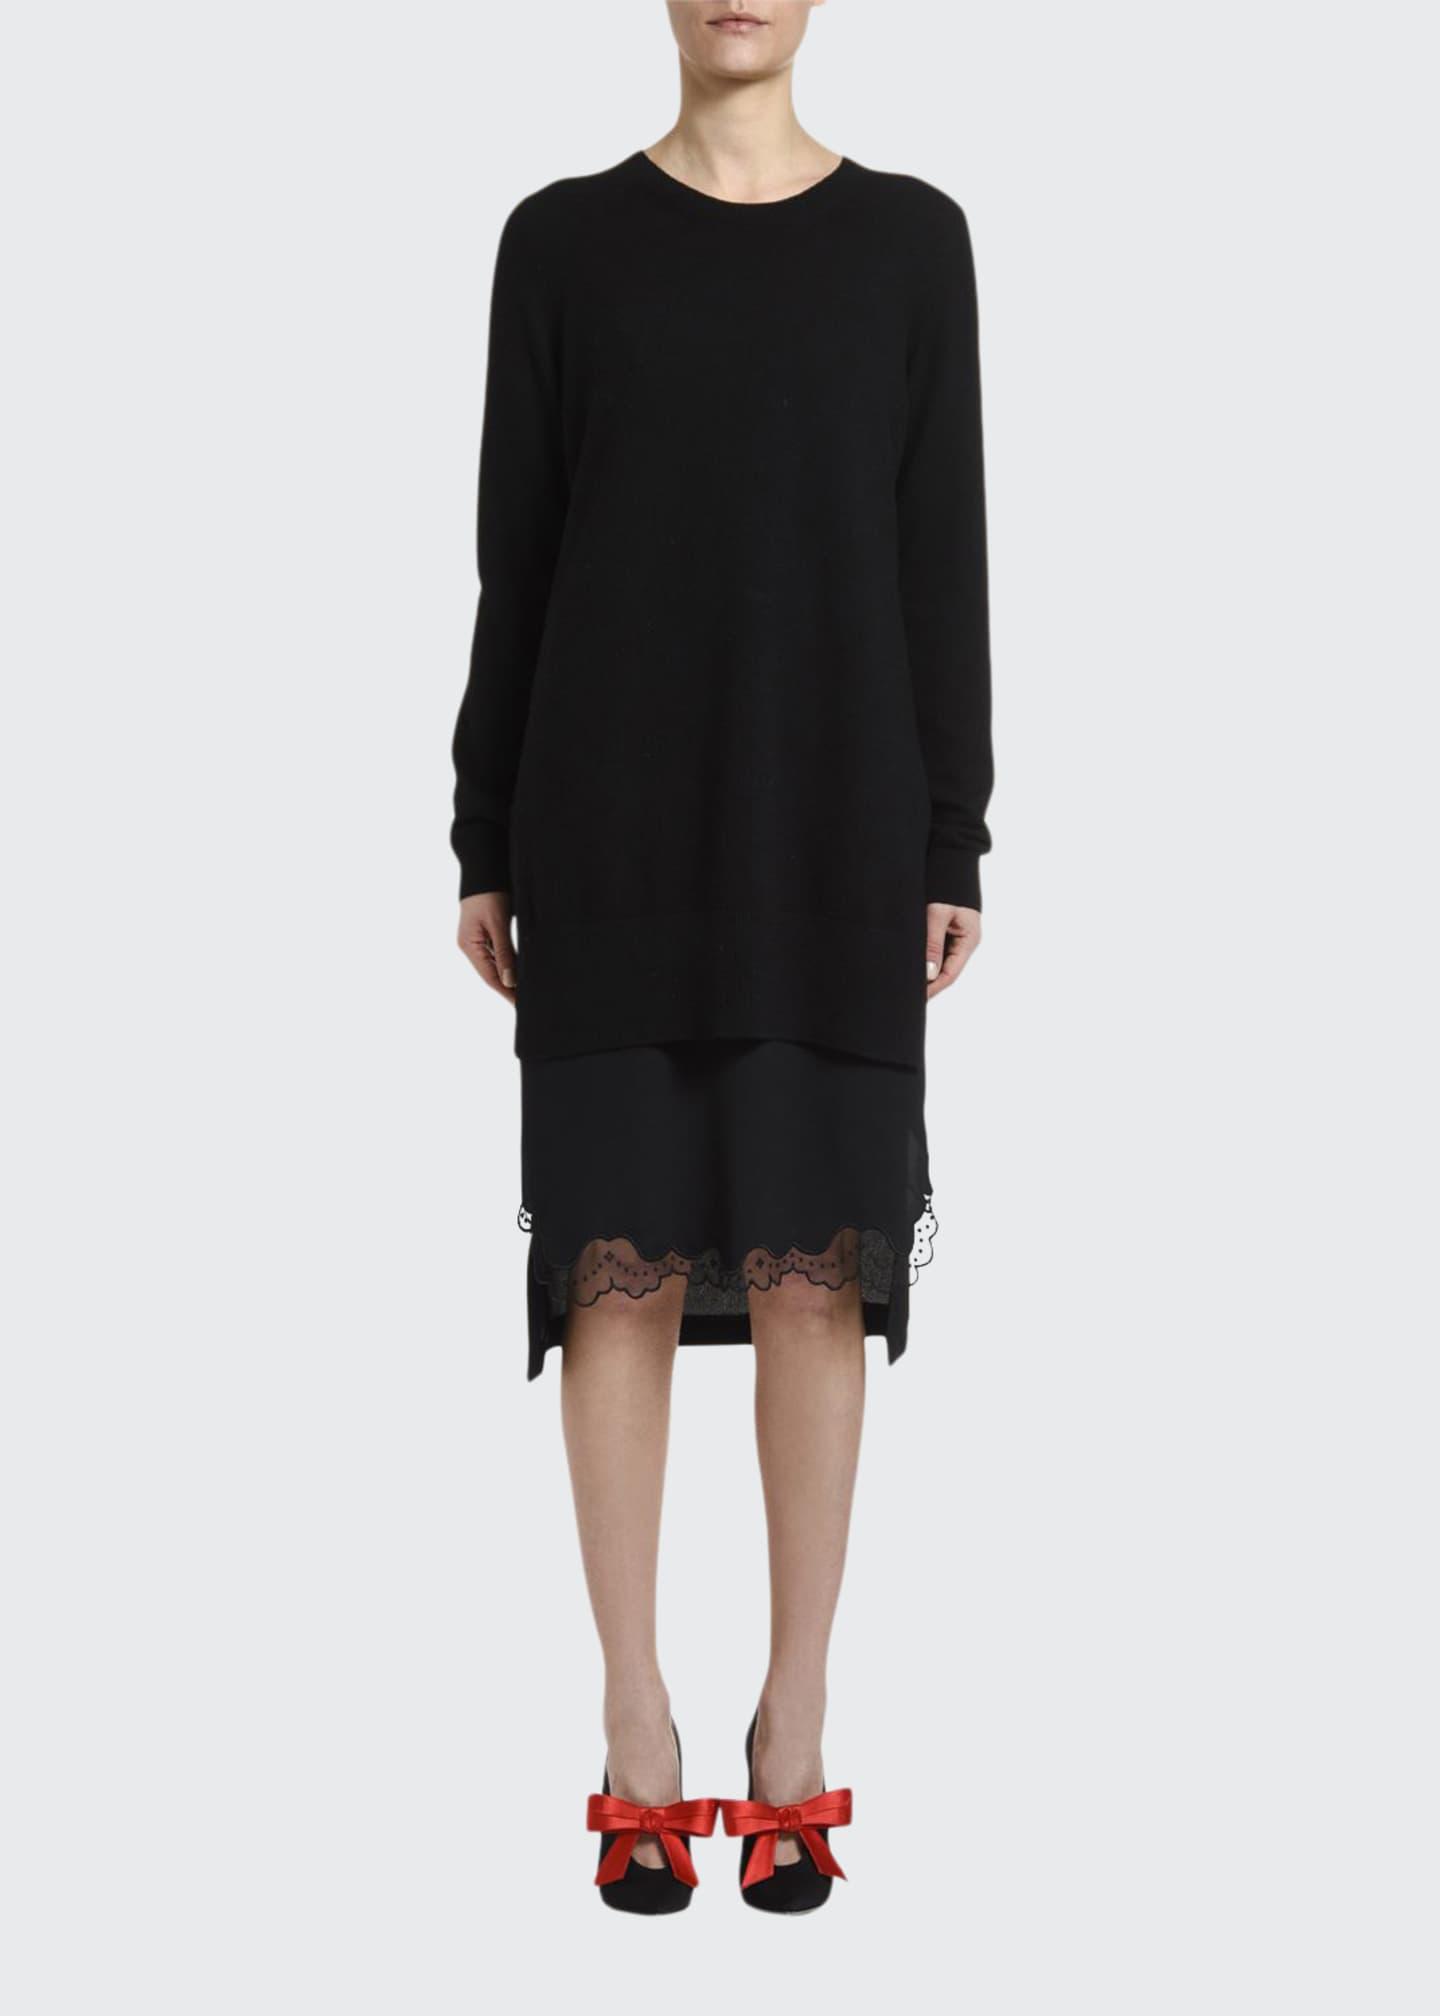 No. 21 Combo Slip Sweater Dress